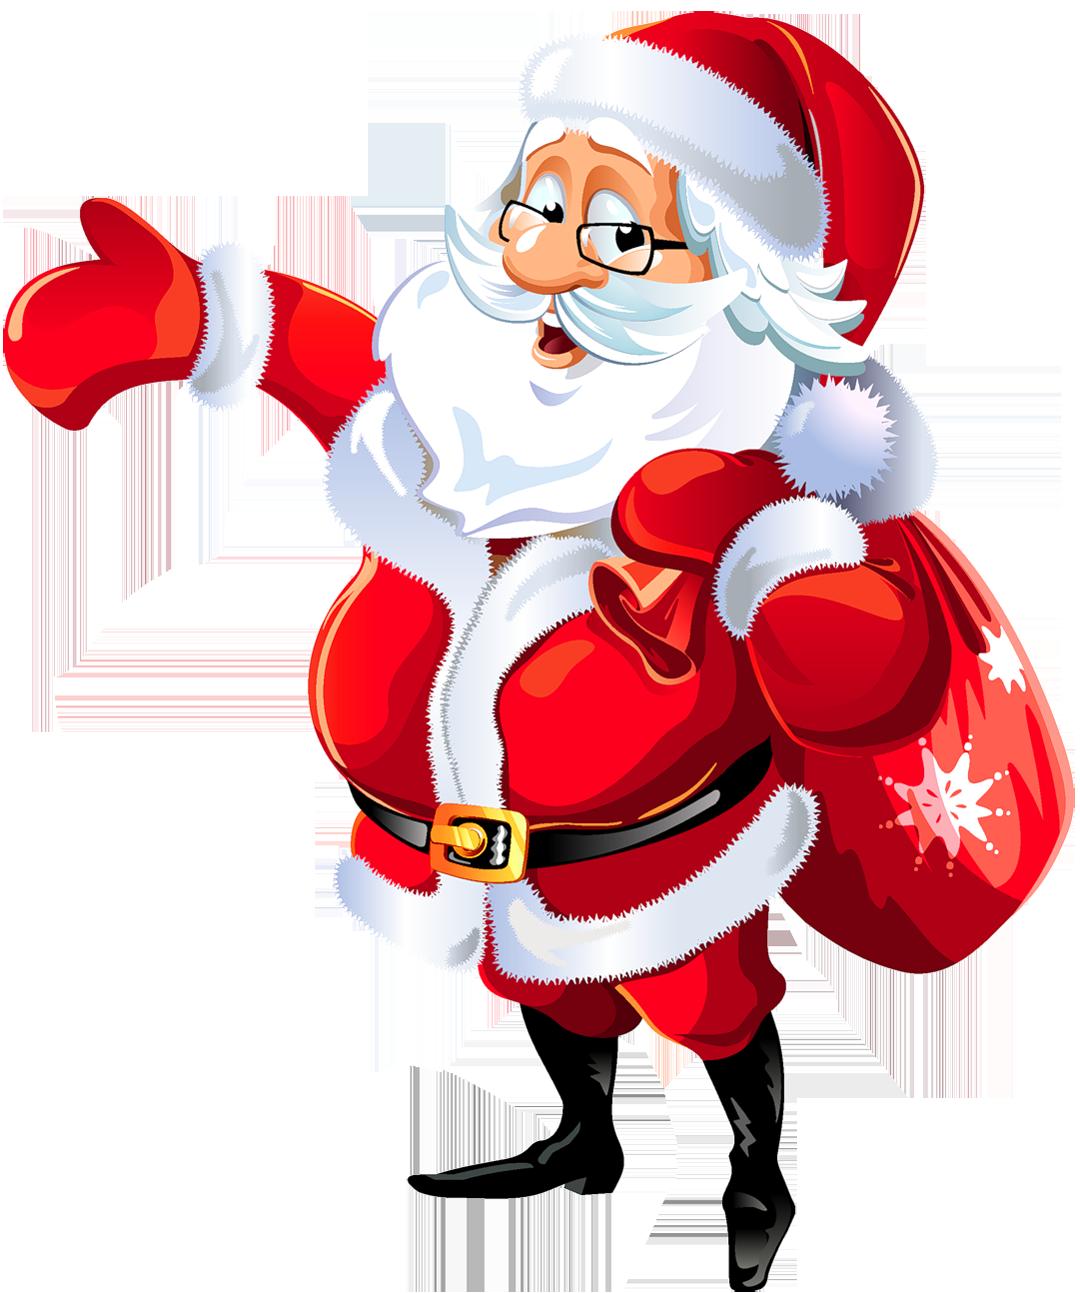 Claus like figures. Clipart santa airplane